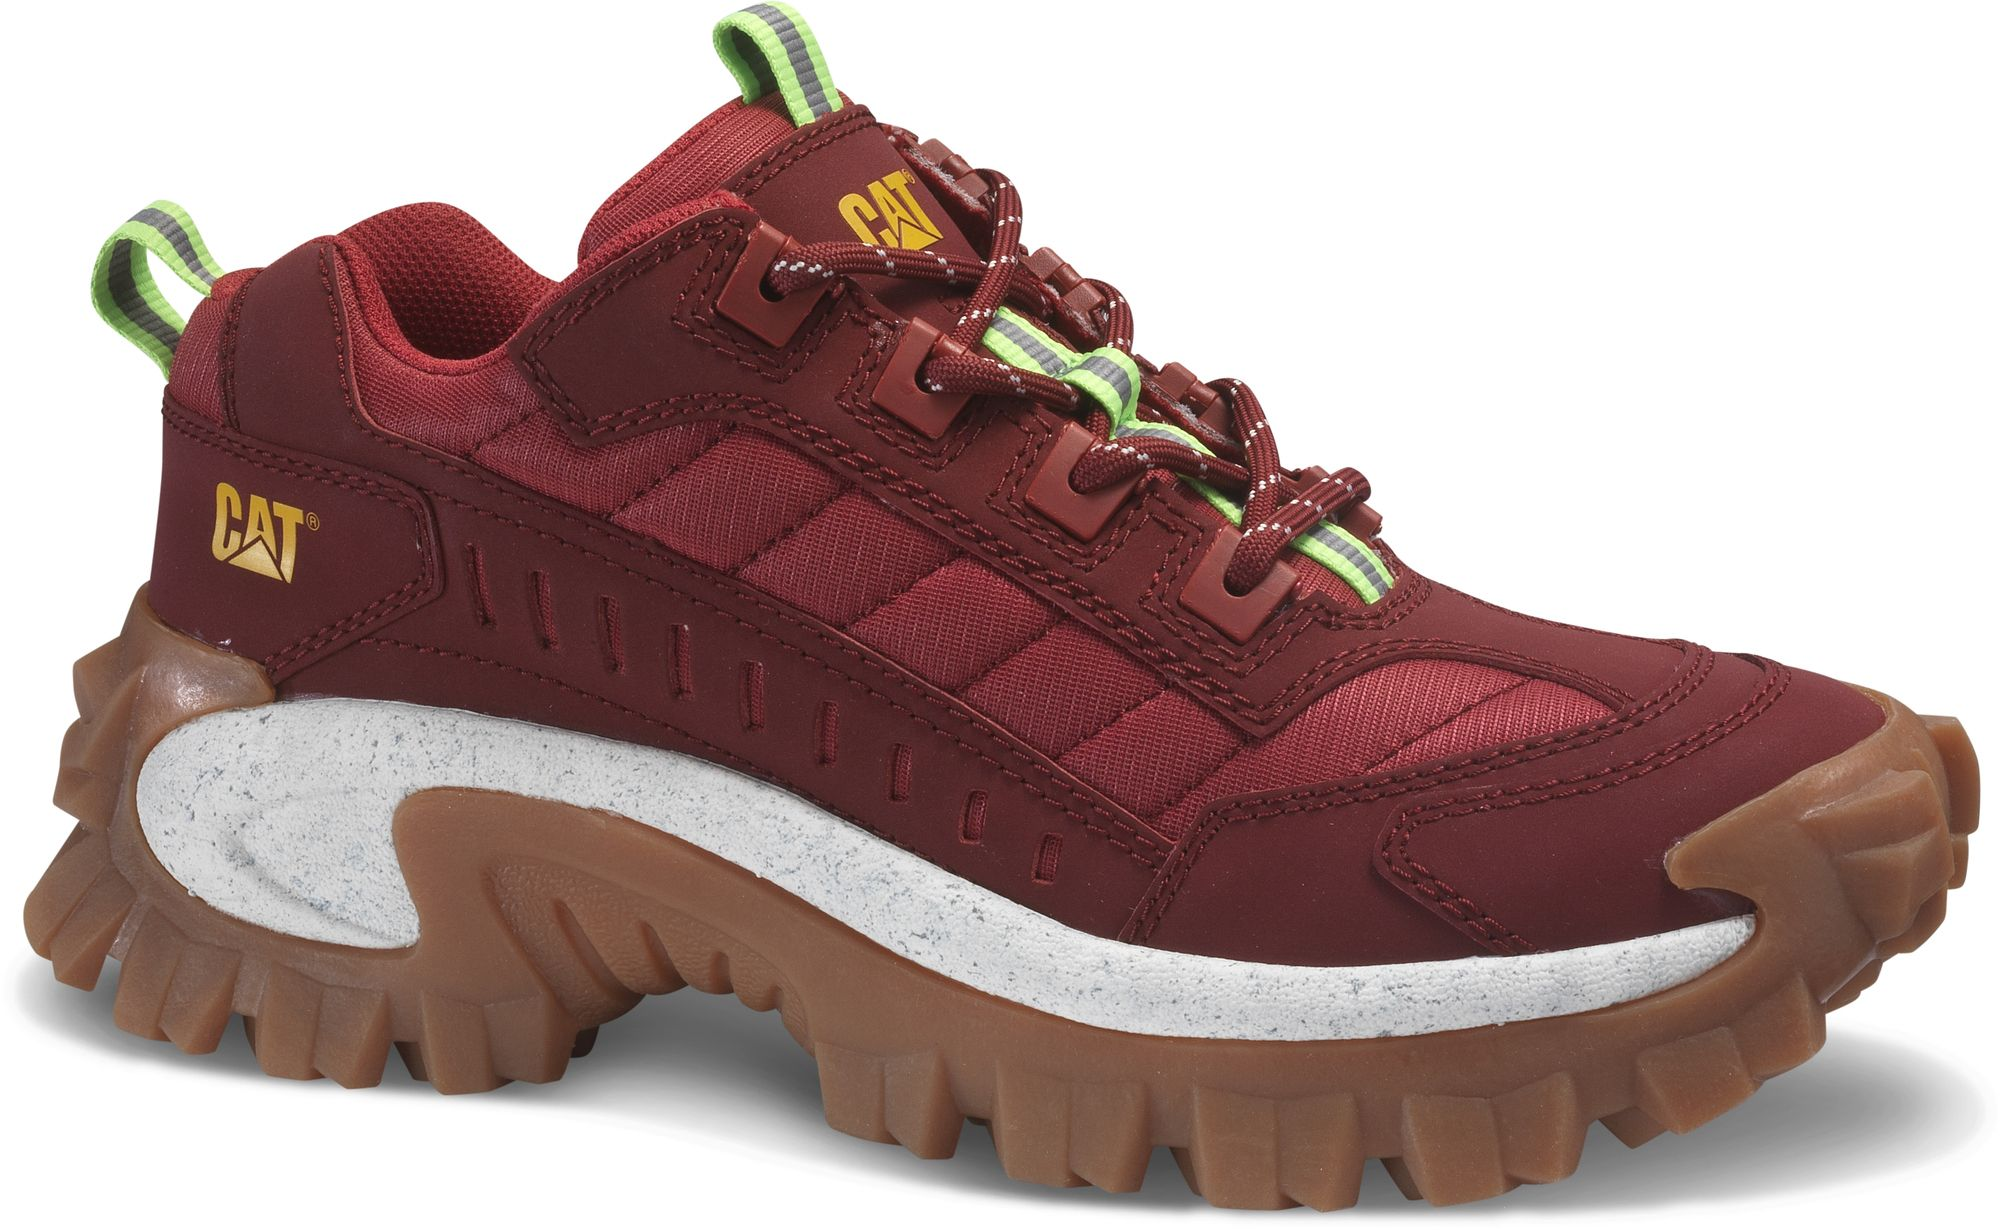 Damskie Buty Miejskie Caterpillar Intruder Sketchers Sneakers Shoes Sneakers